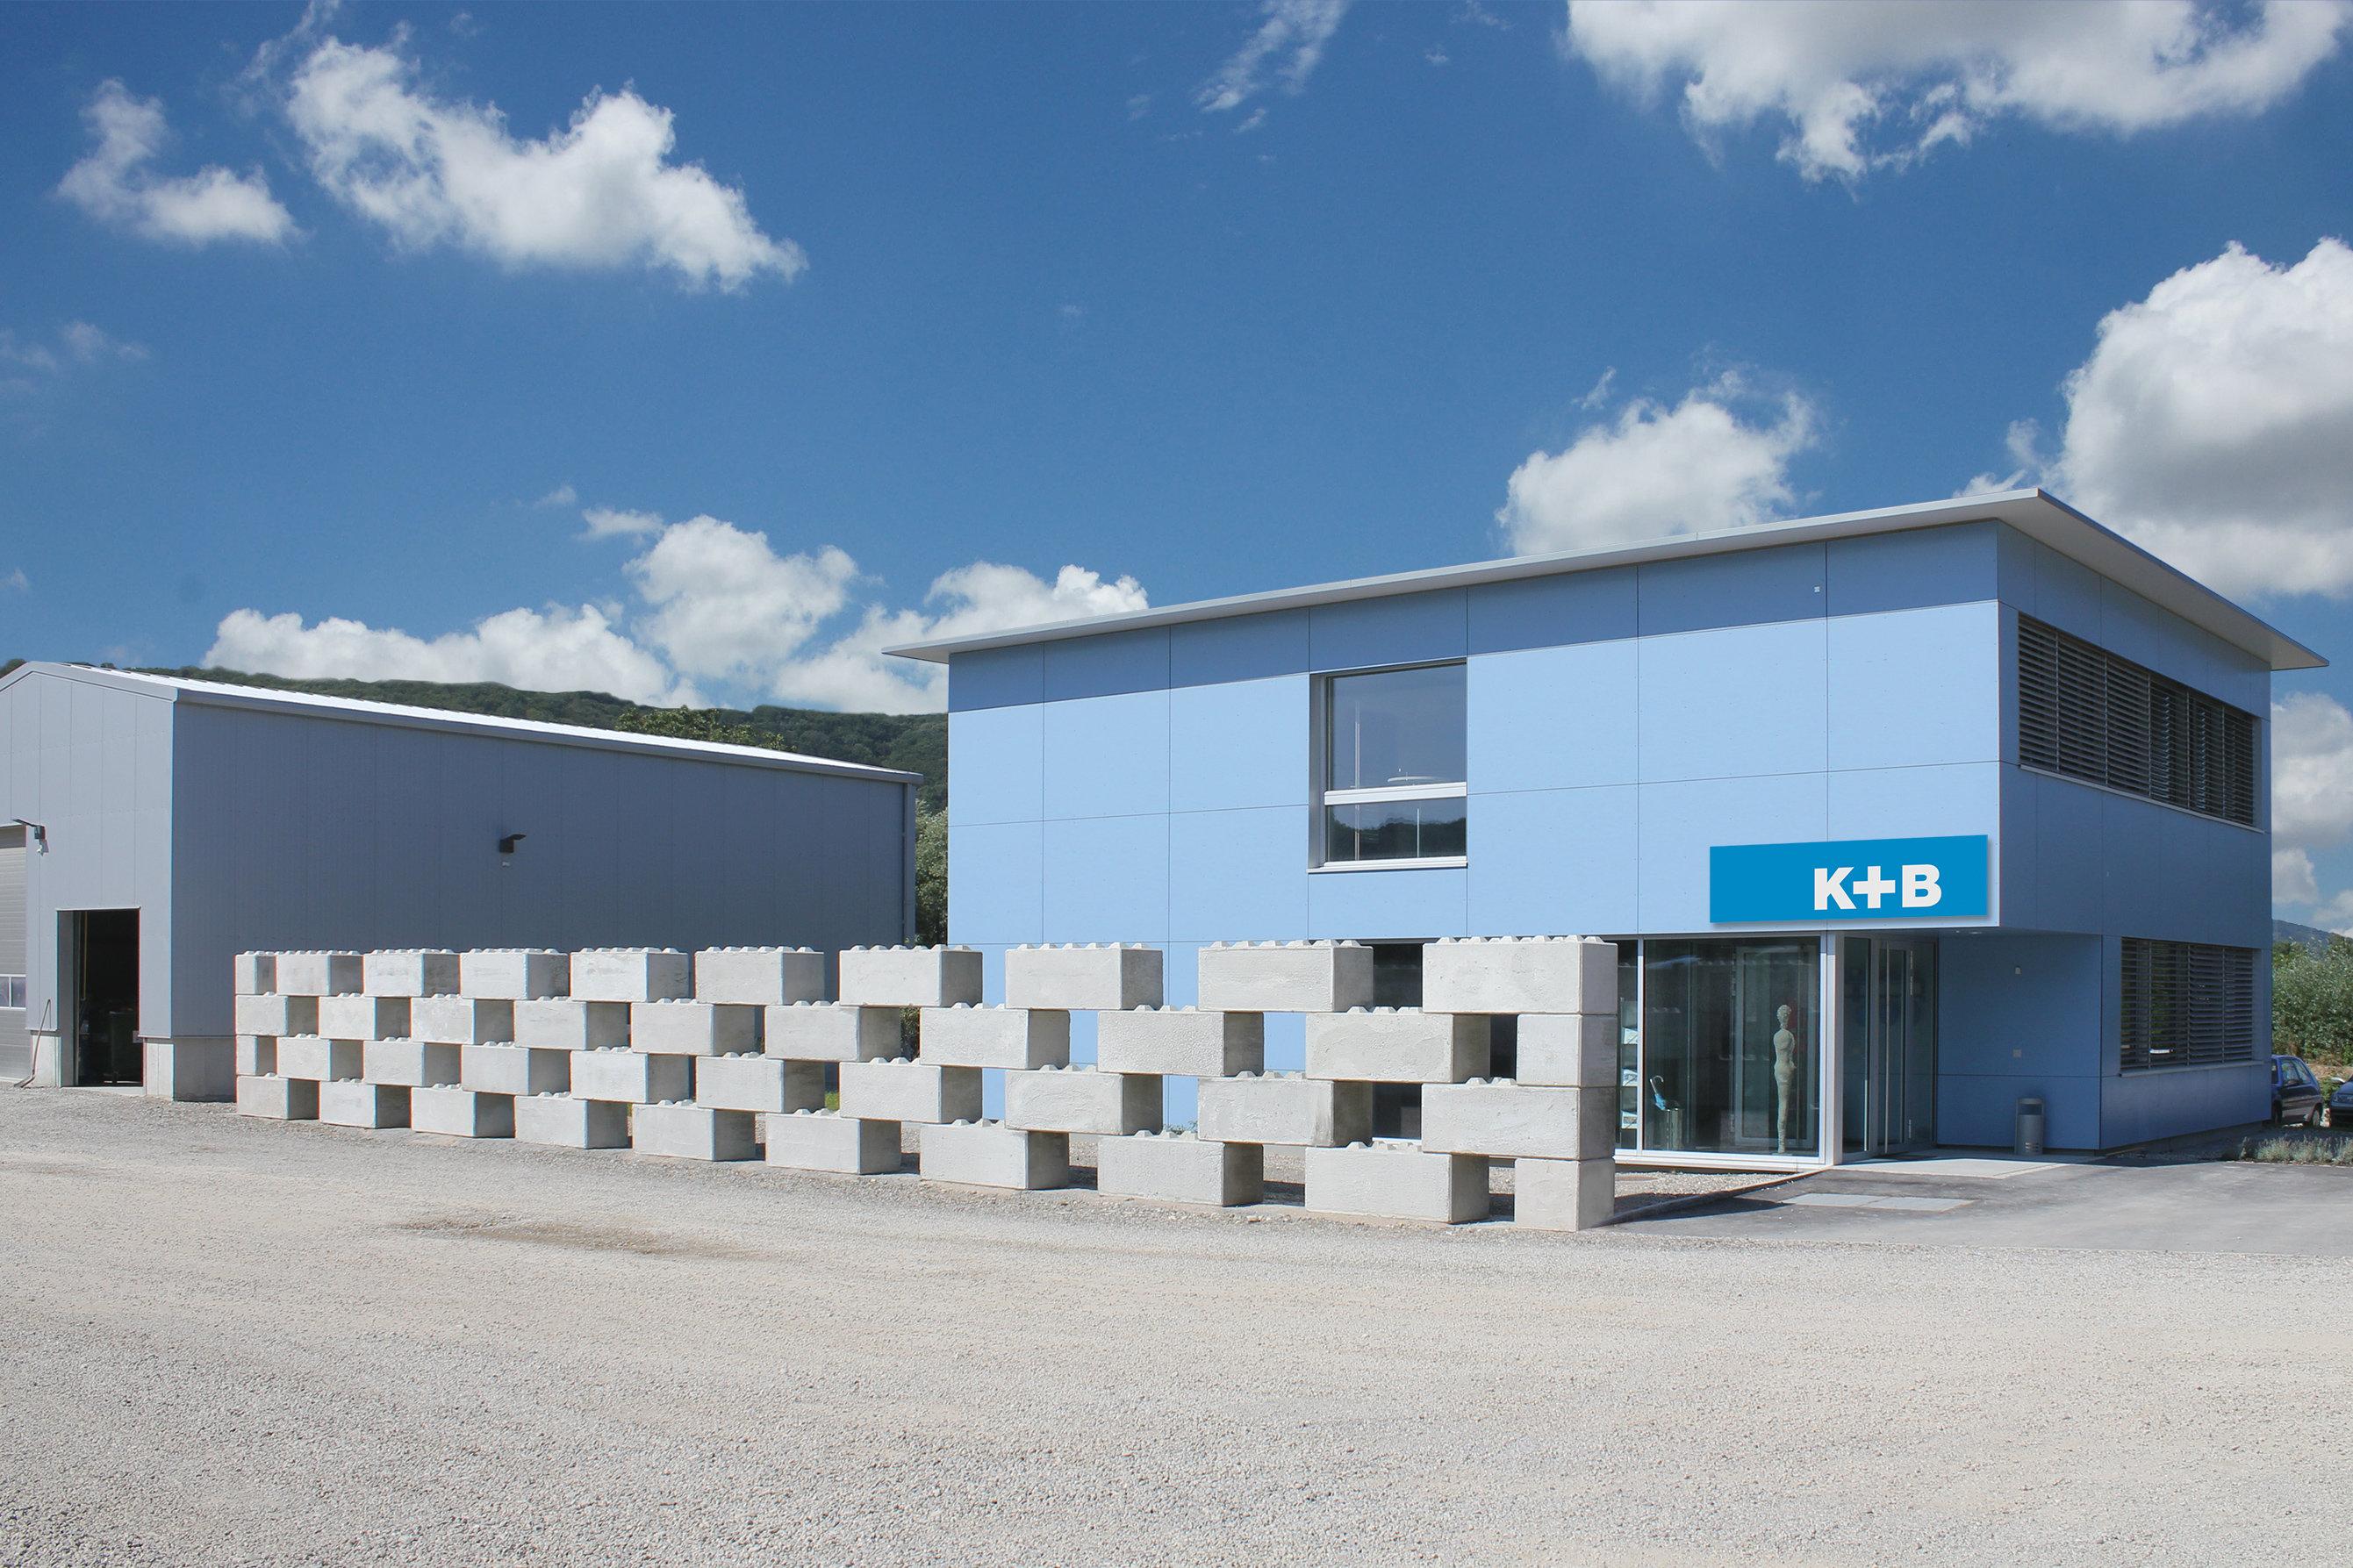 Bürogebäude K+B